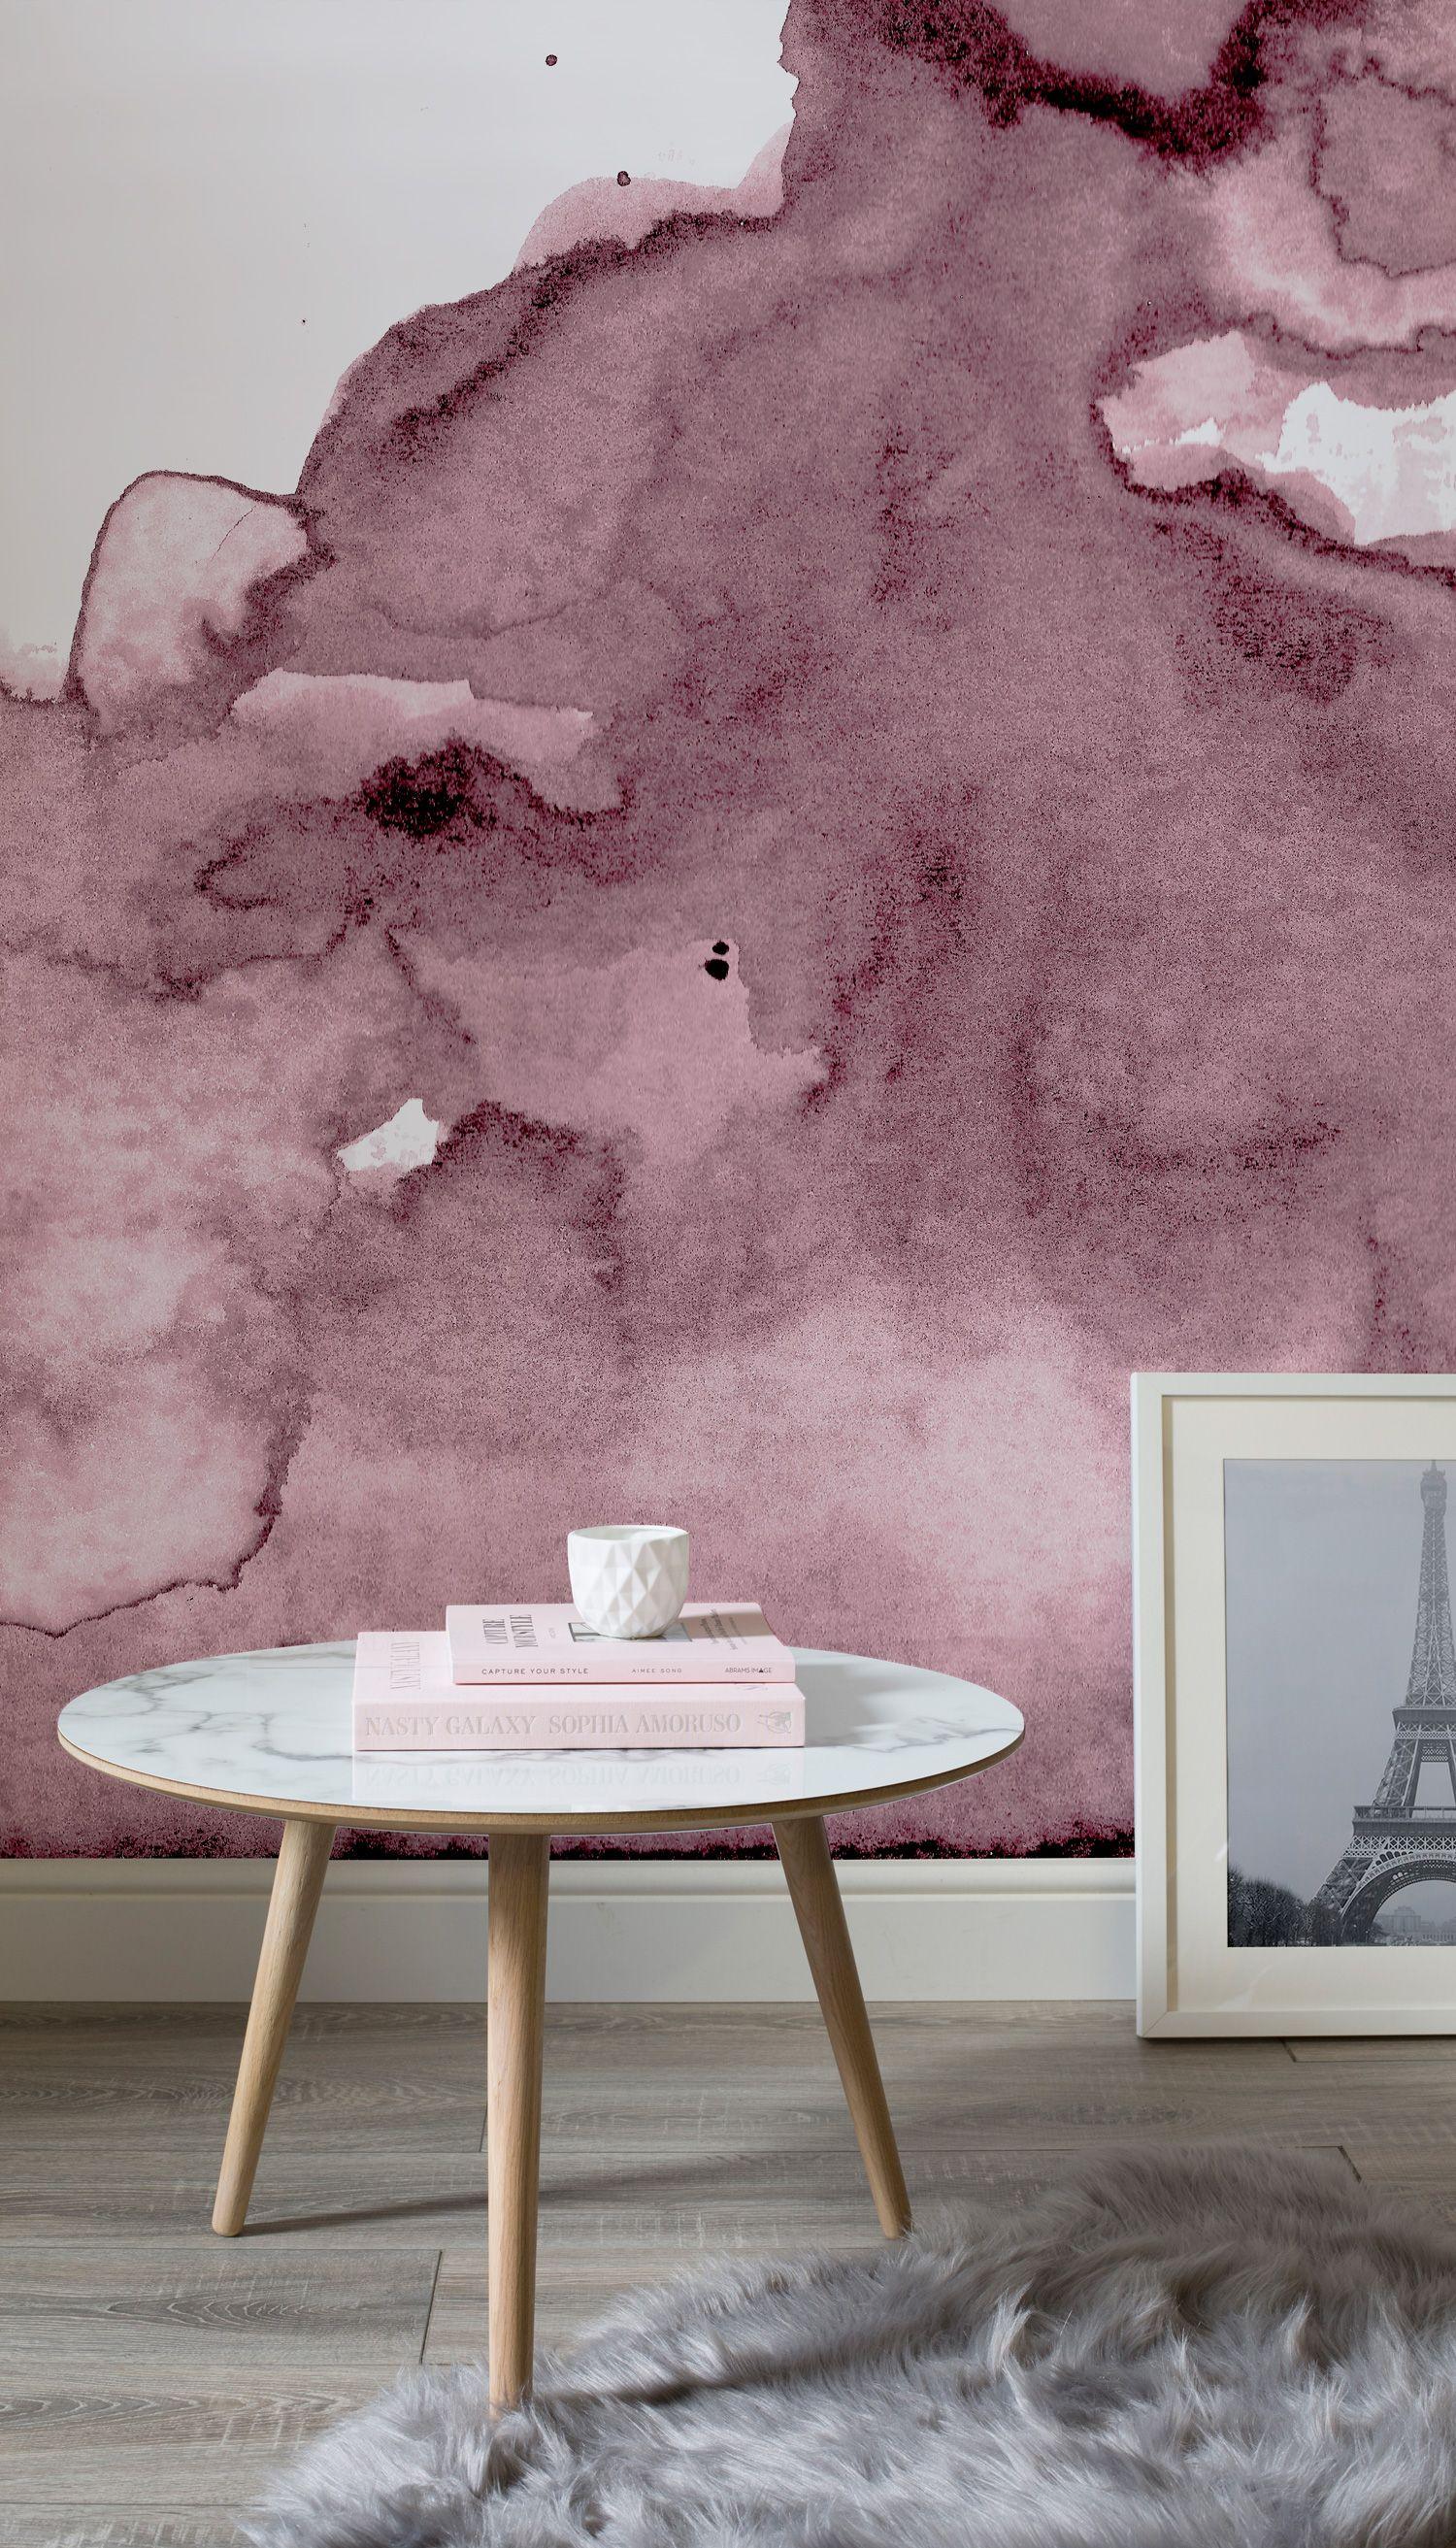 Dusty Pink Watercolor Wall Mural Vintage Einrichtungen Aquarell